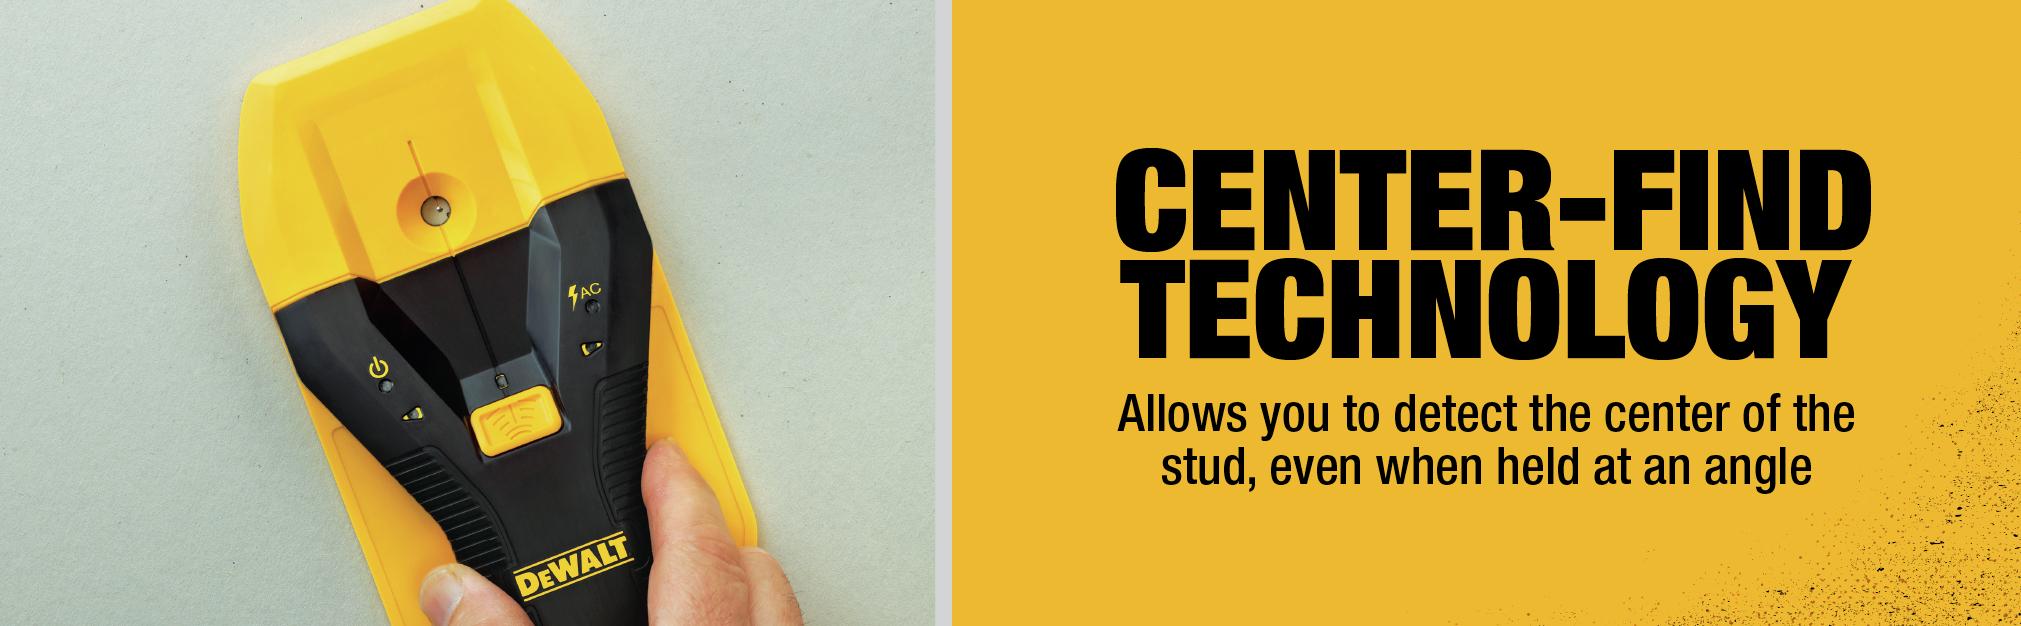 Center-Find Technology